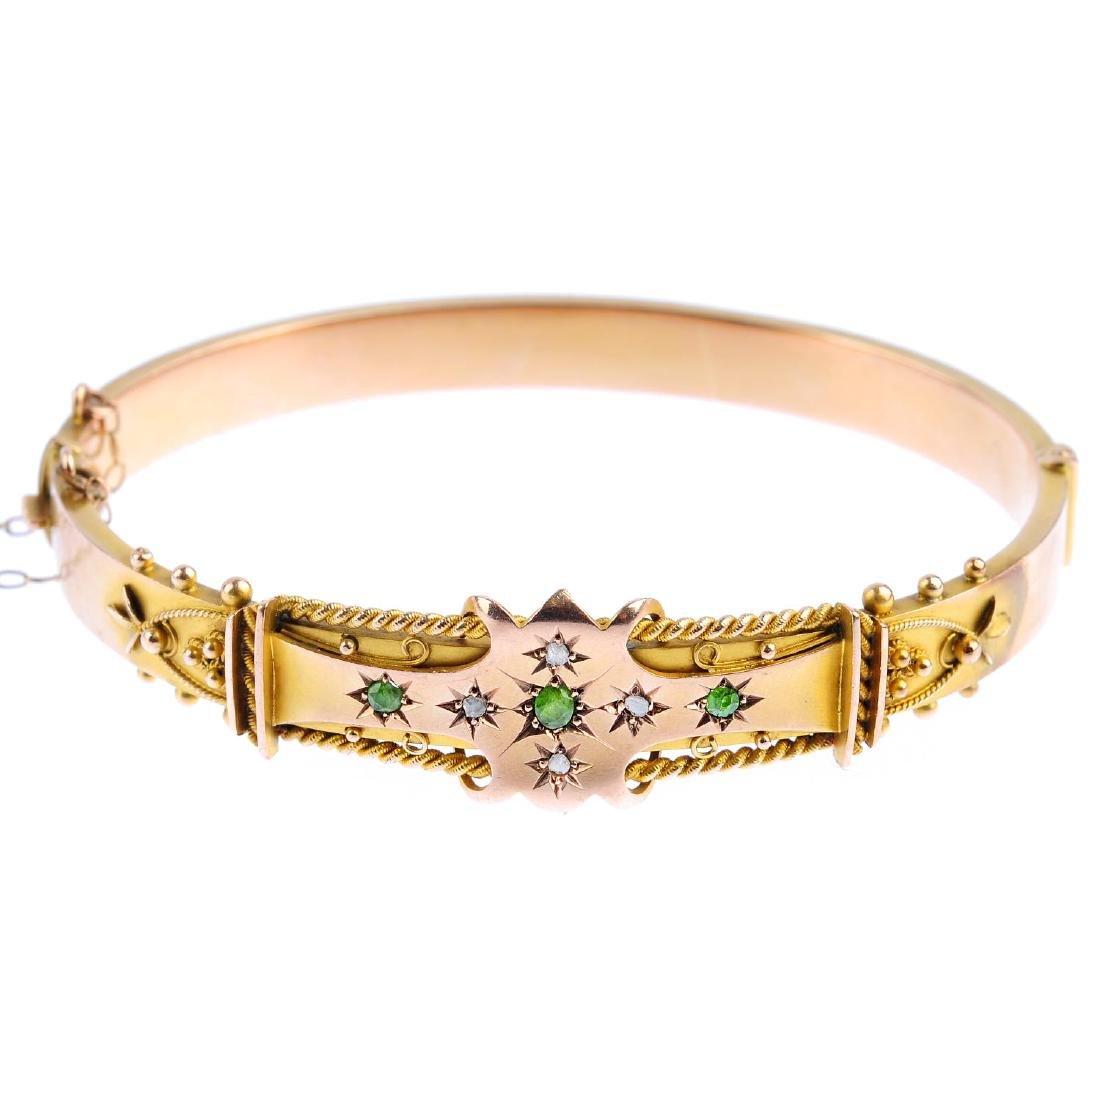 An Edwardian 9ct gold demantoid garnet and diamond